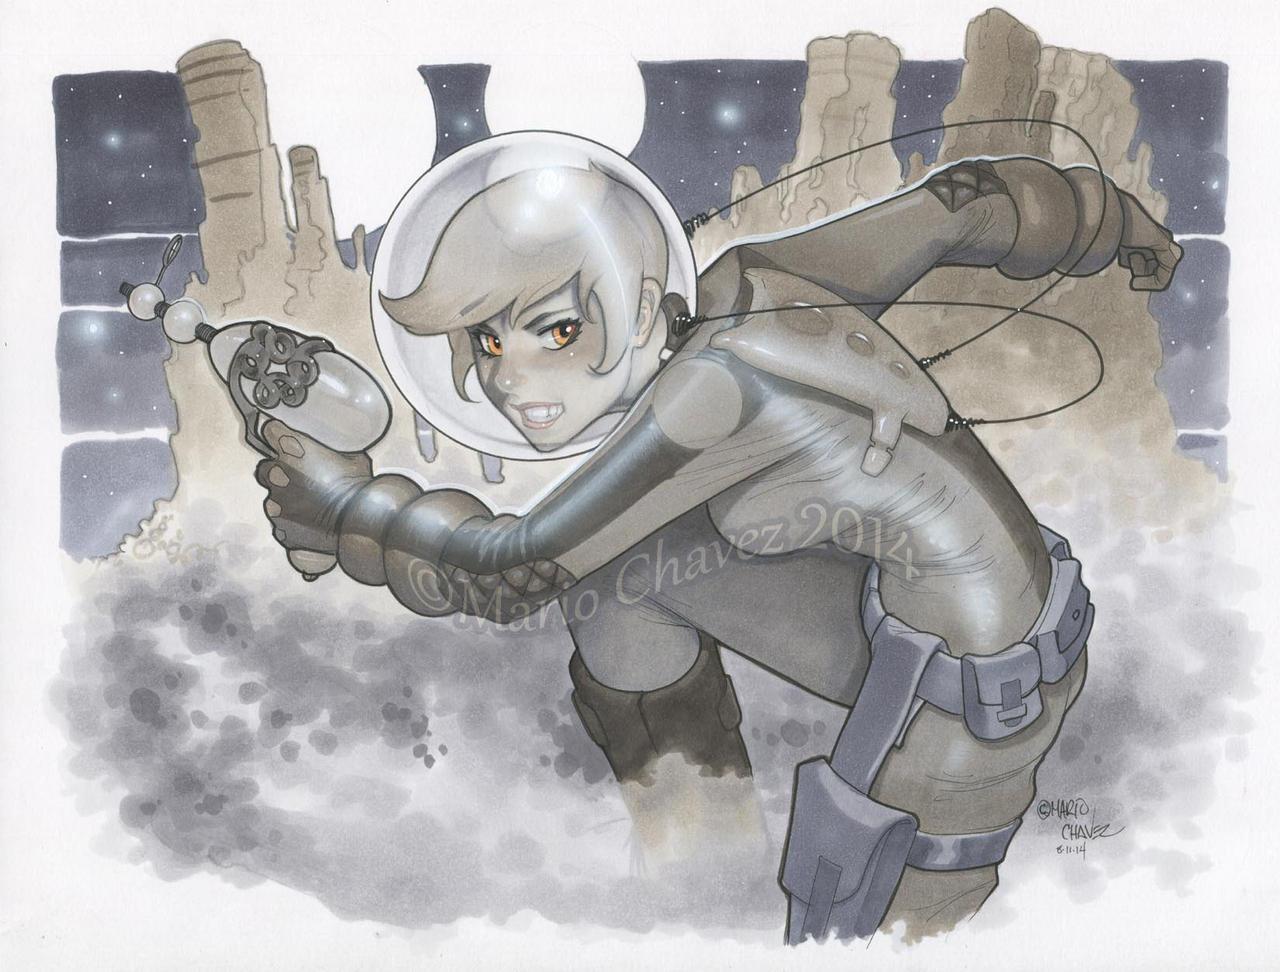 Space Ranger by MarioChavez